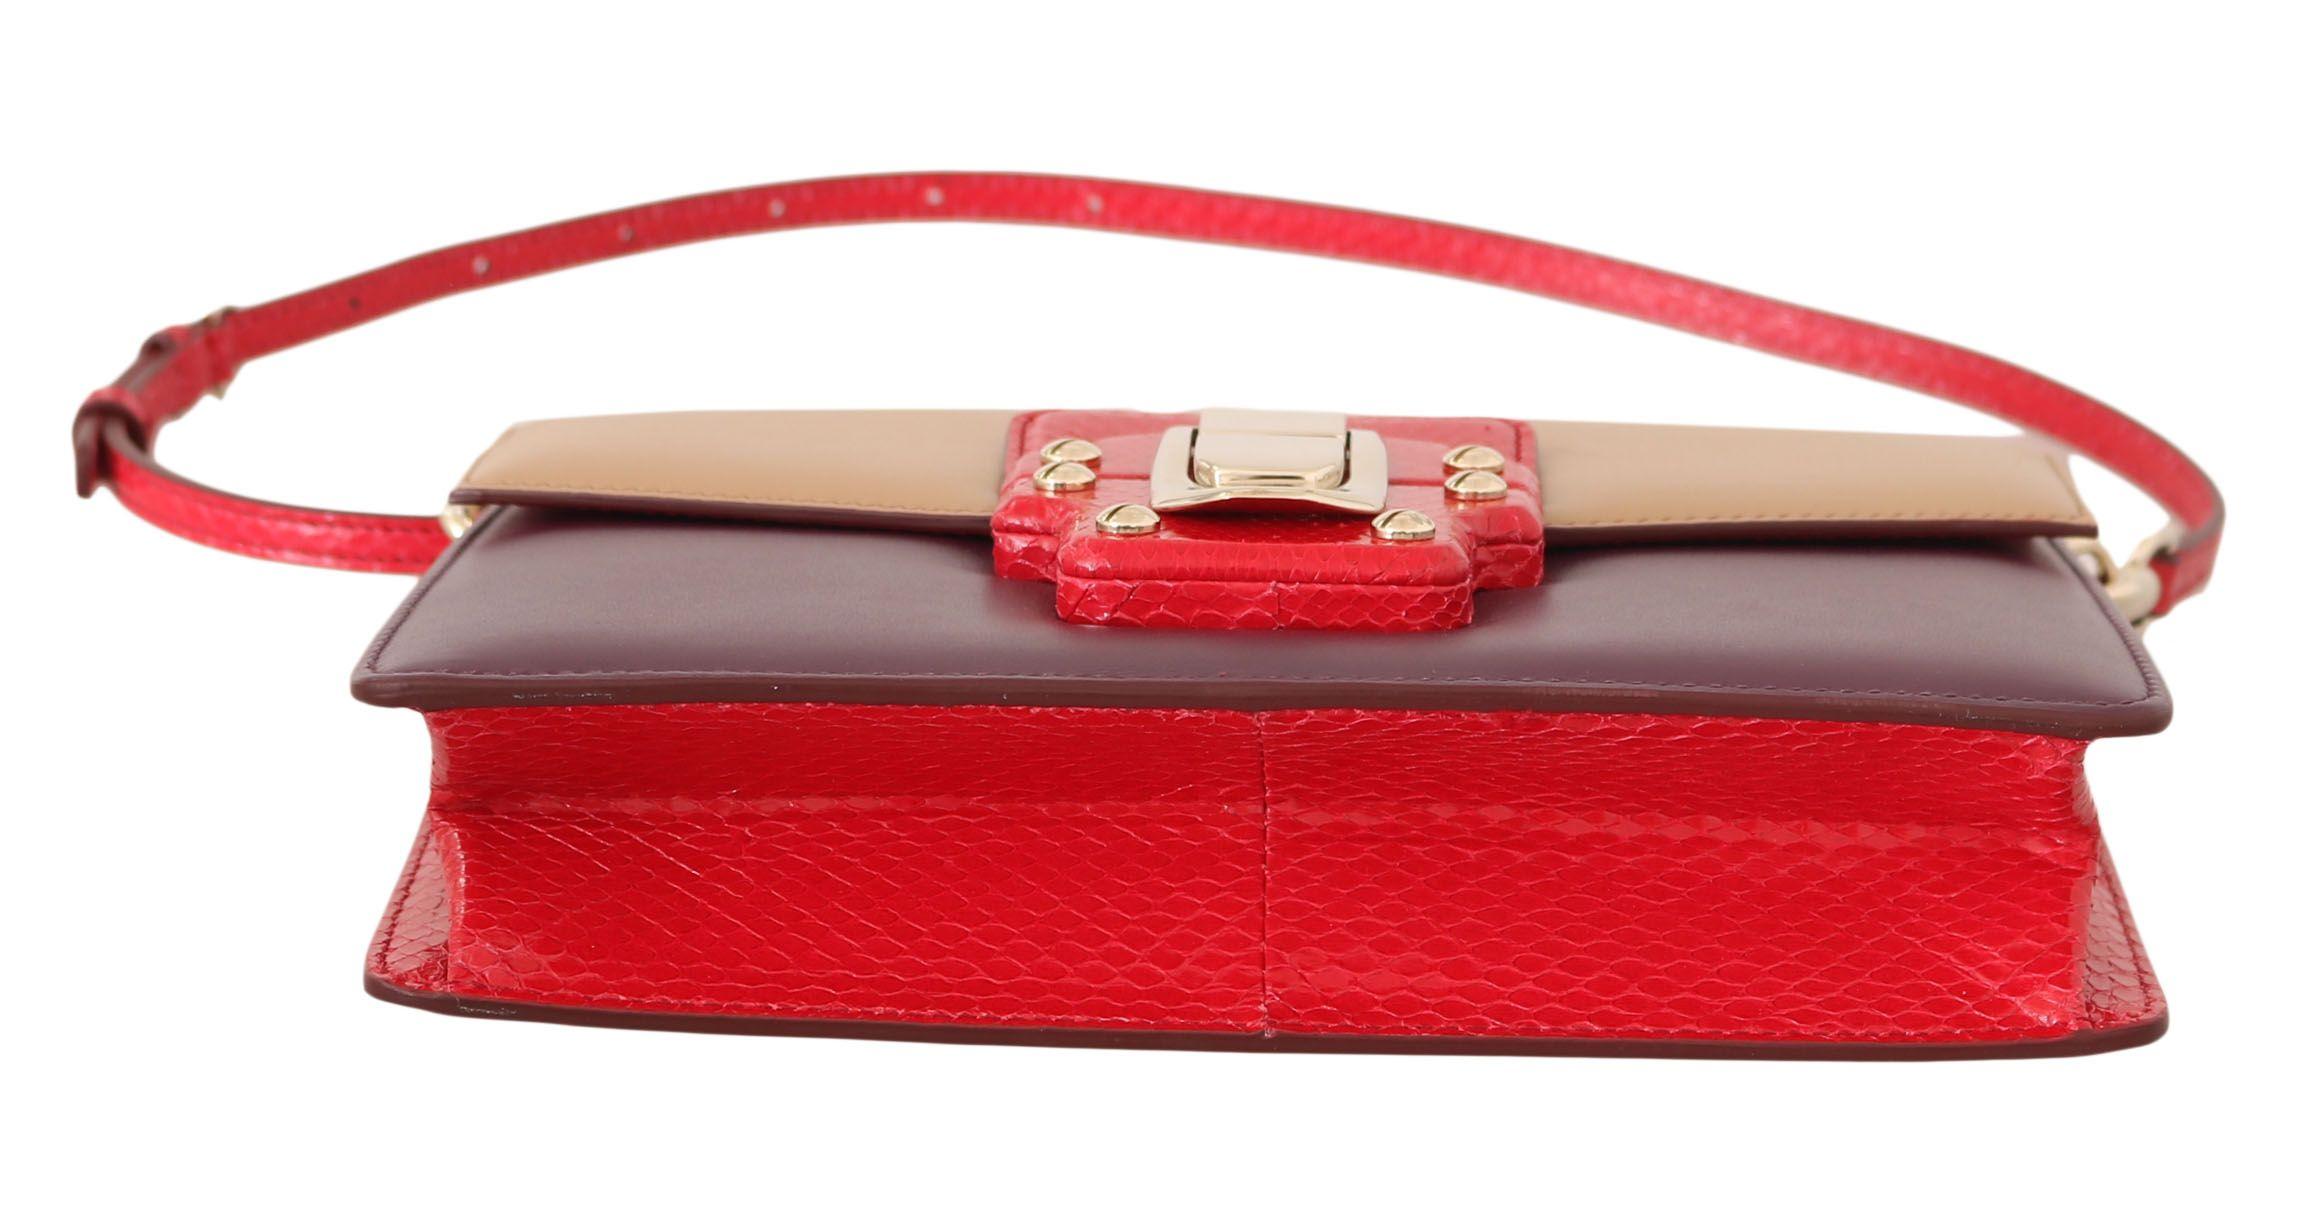 Dolce & Gabbana Purple Beige Red Leather Crossbody LUCIA Purse